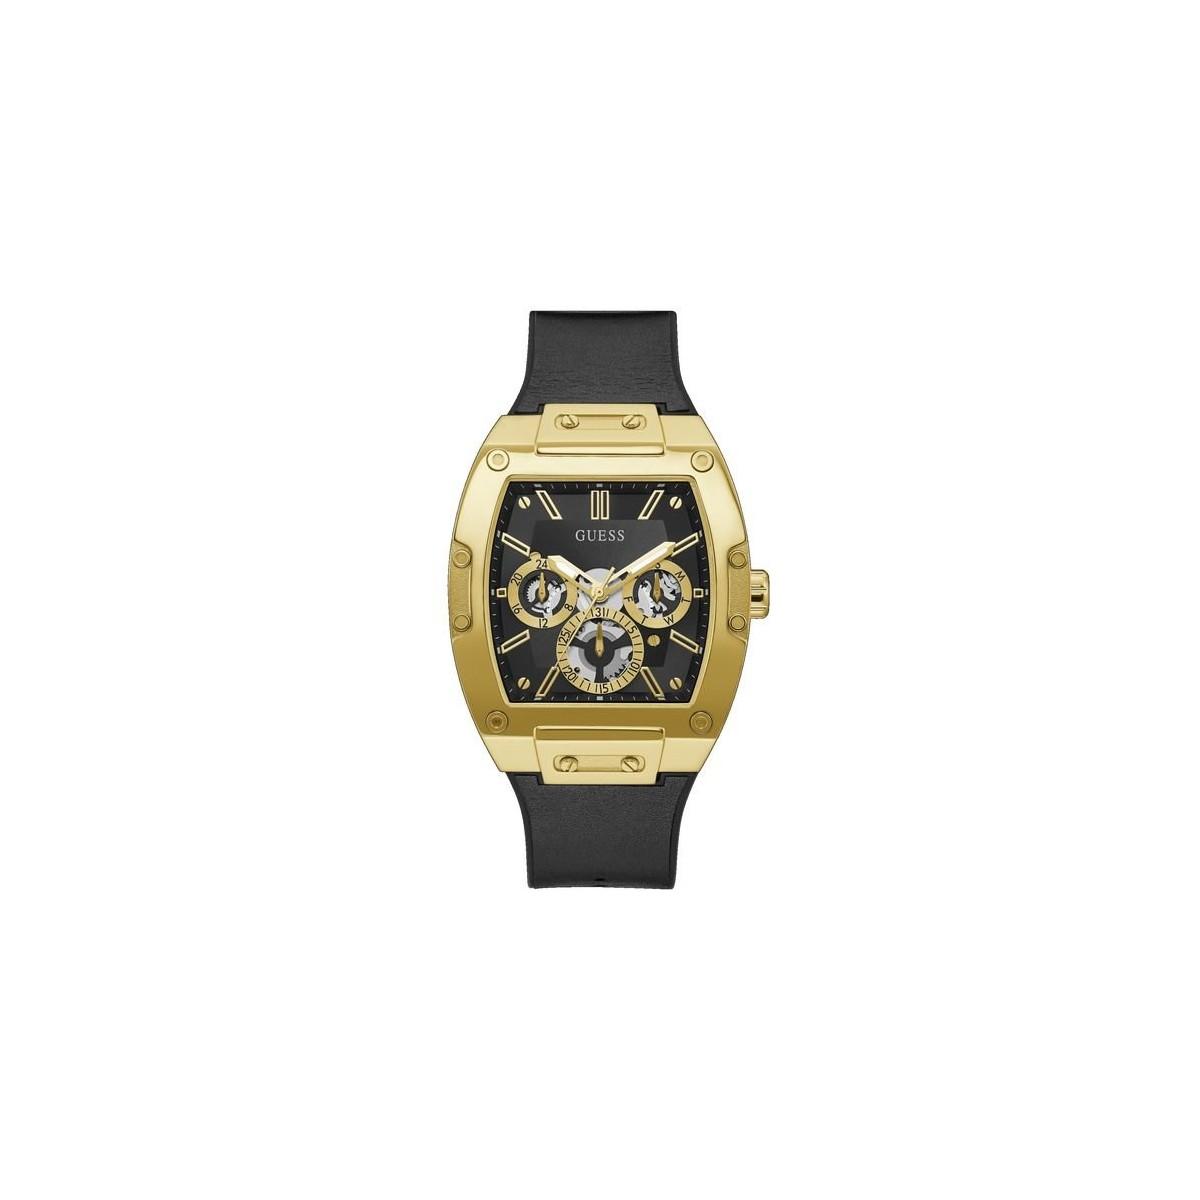 https://www.gaberjoyeria.com/6295-thickbox_default/reloj-guess-phoenix.jpg